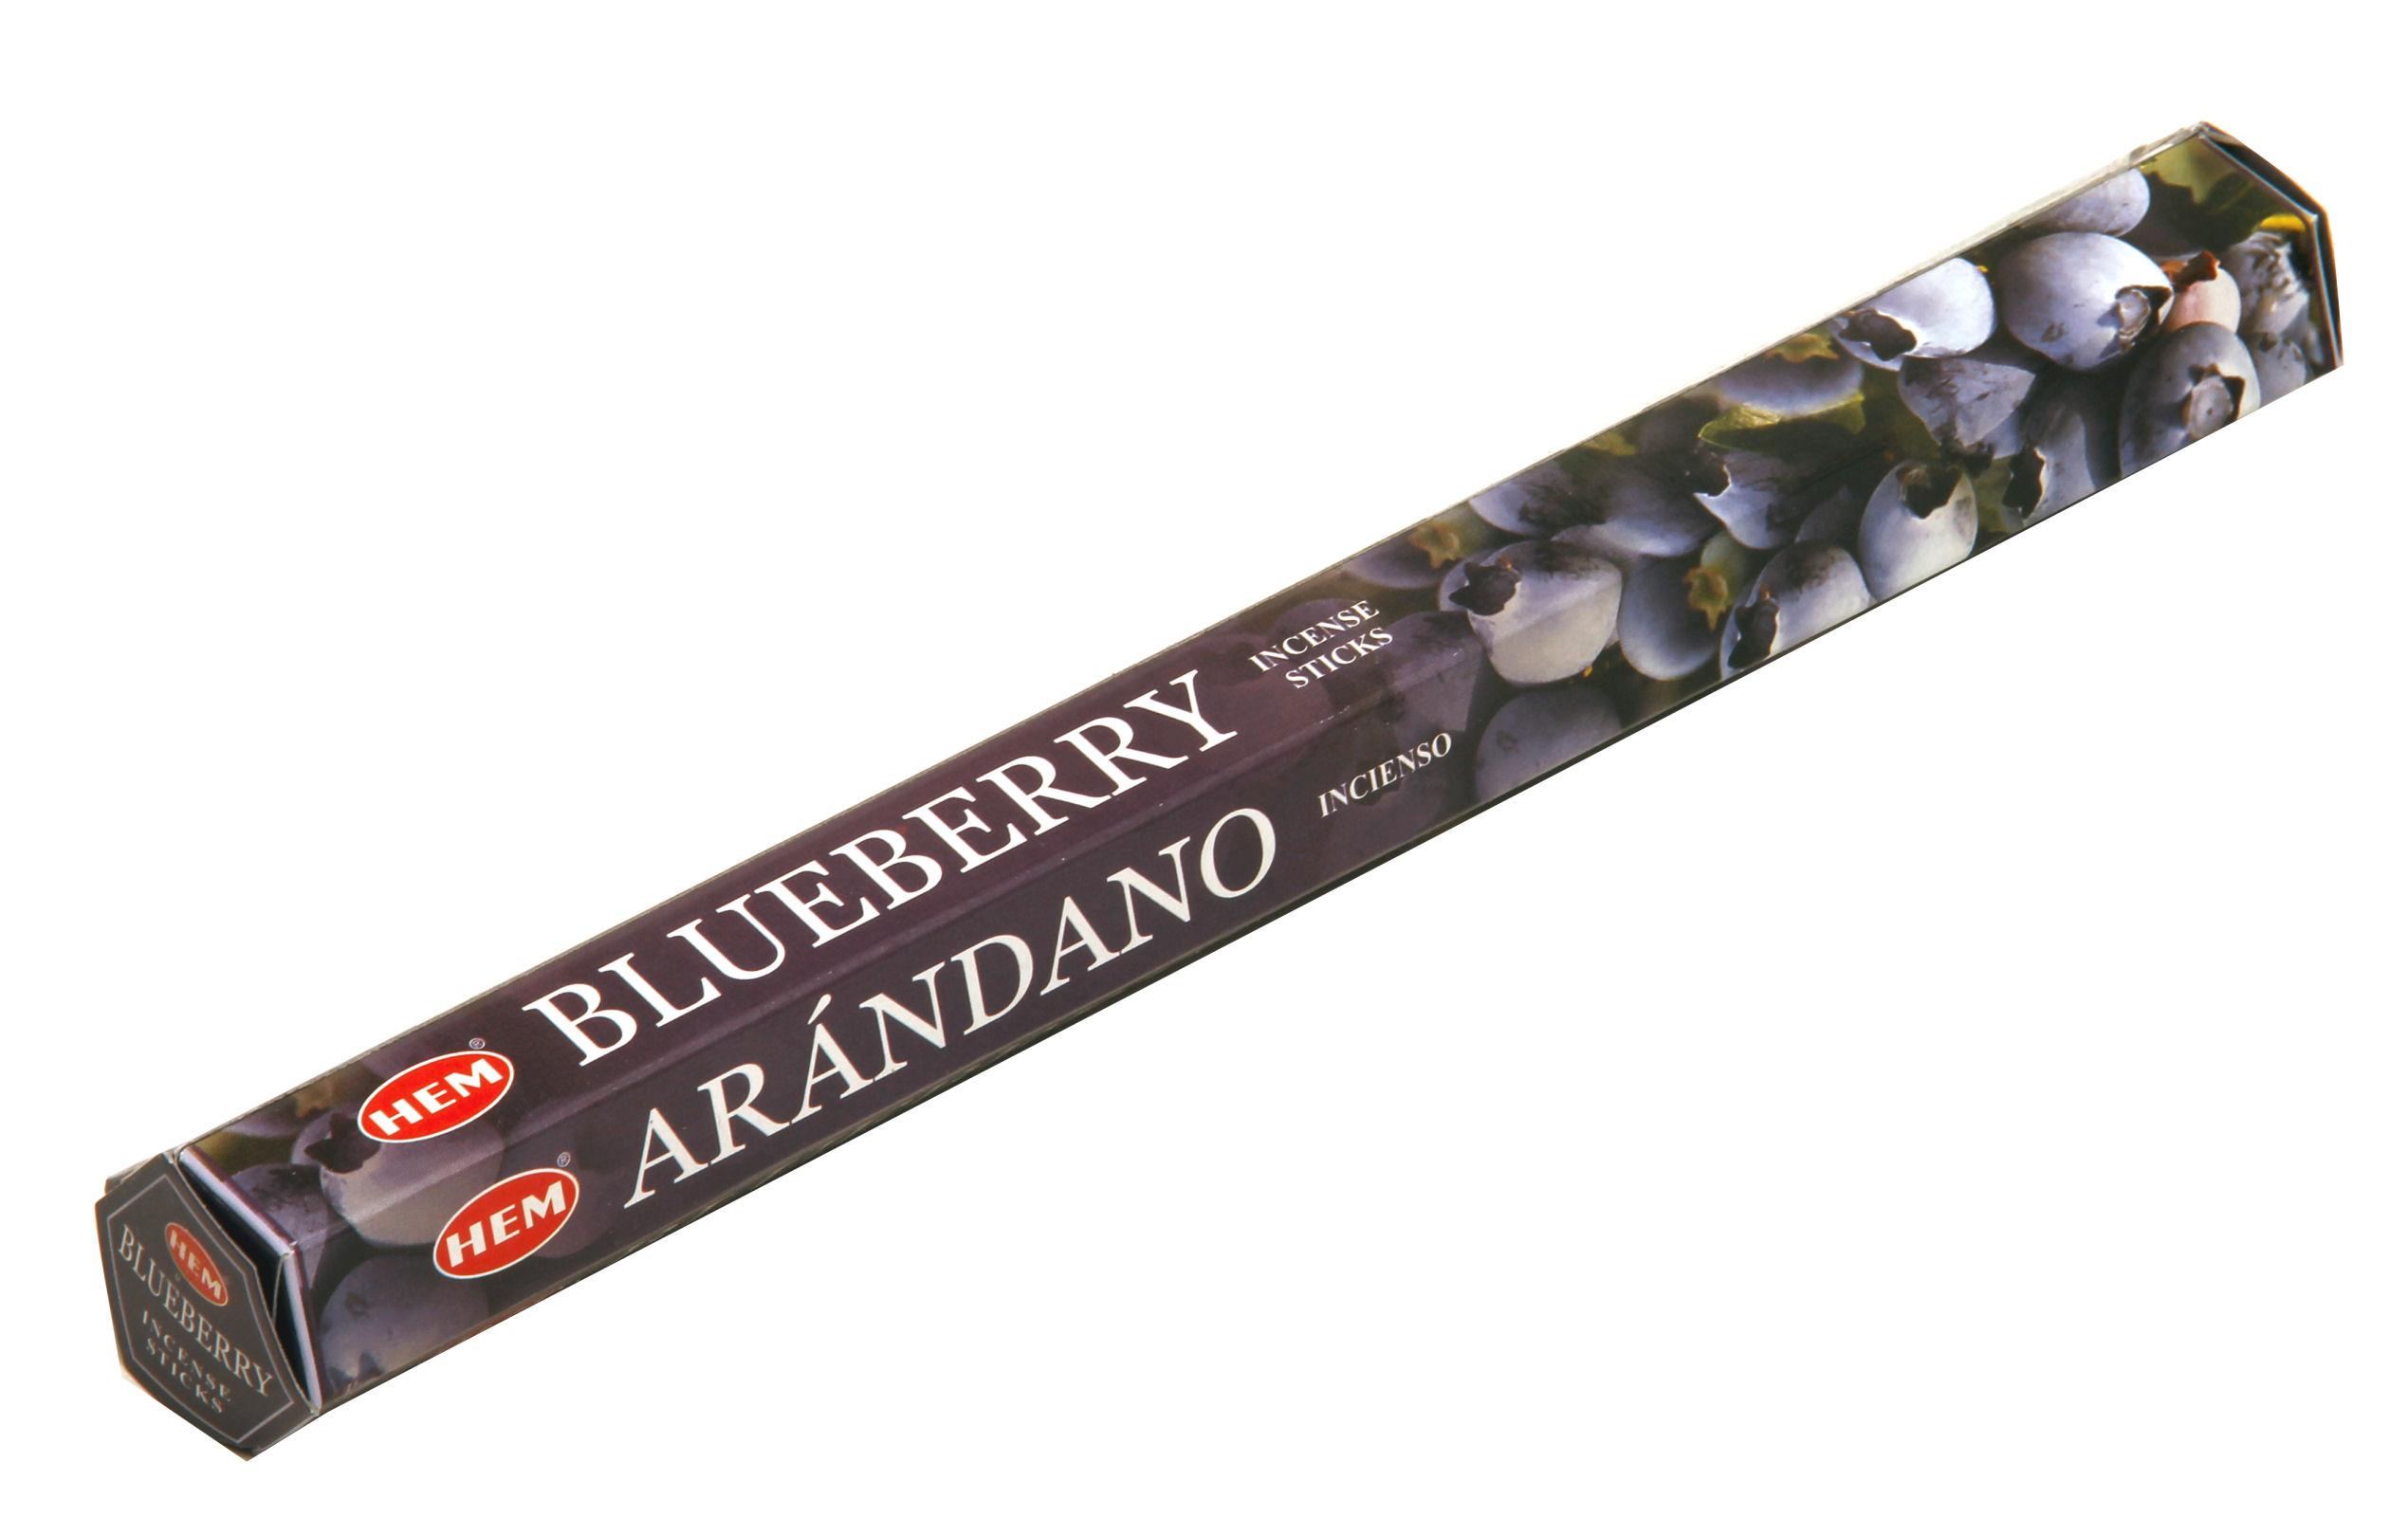 HEM Räucherstäbchen Blueberry 20g Hexa Packung  Ca. 20 Incence Sticks